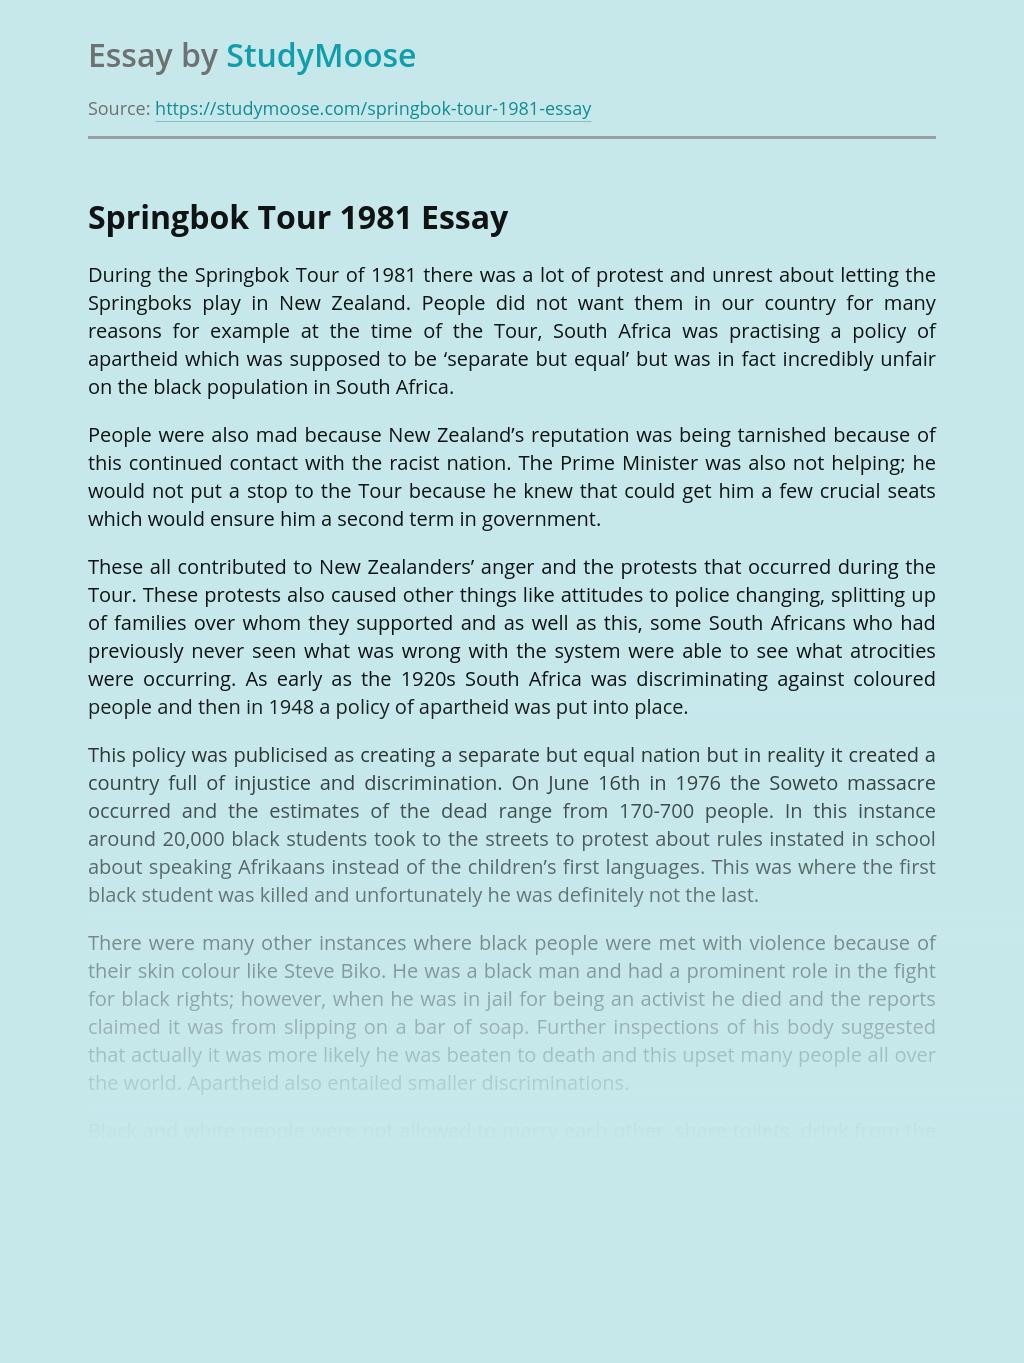 Springbok tour 1981 essay best masters essay proofreading services uk